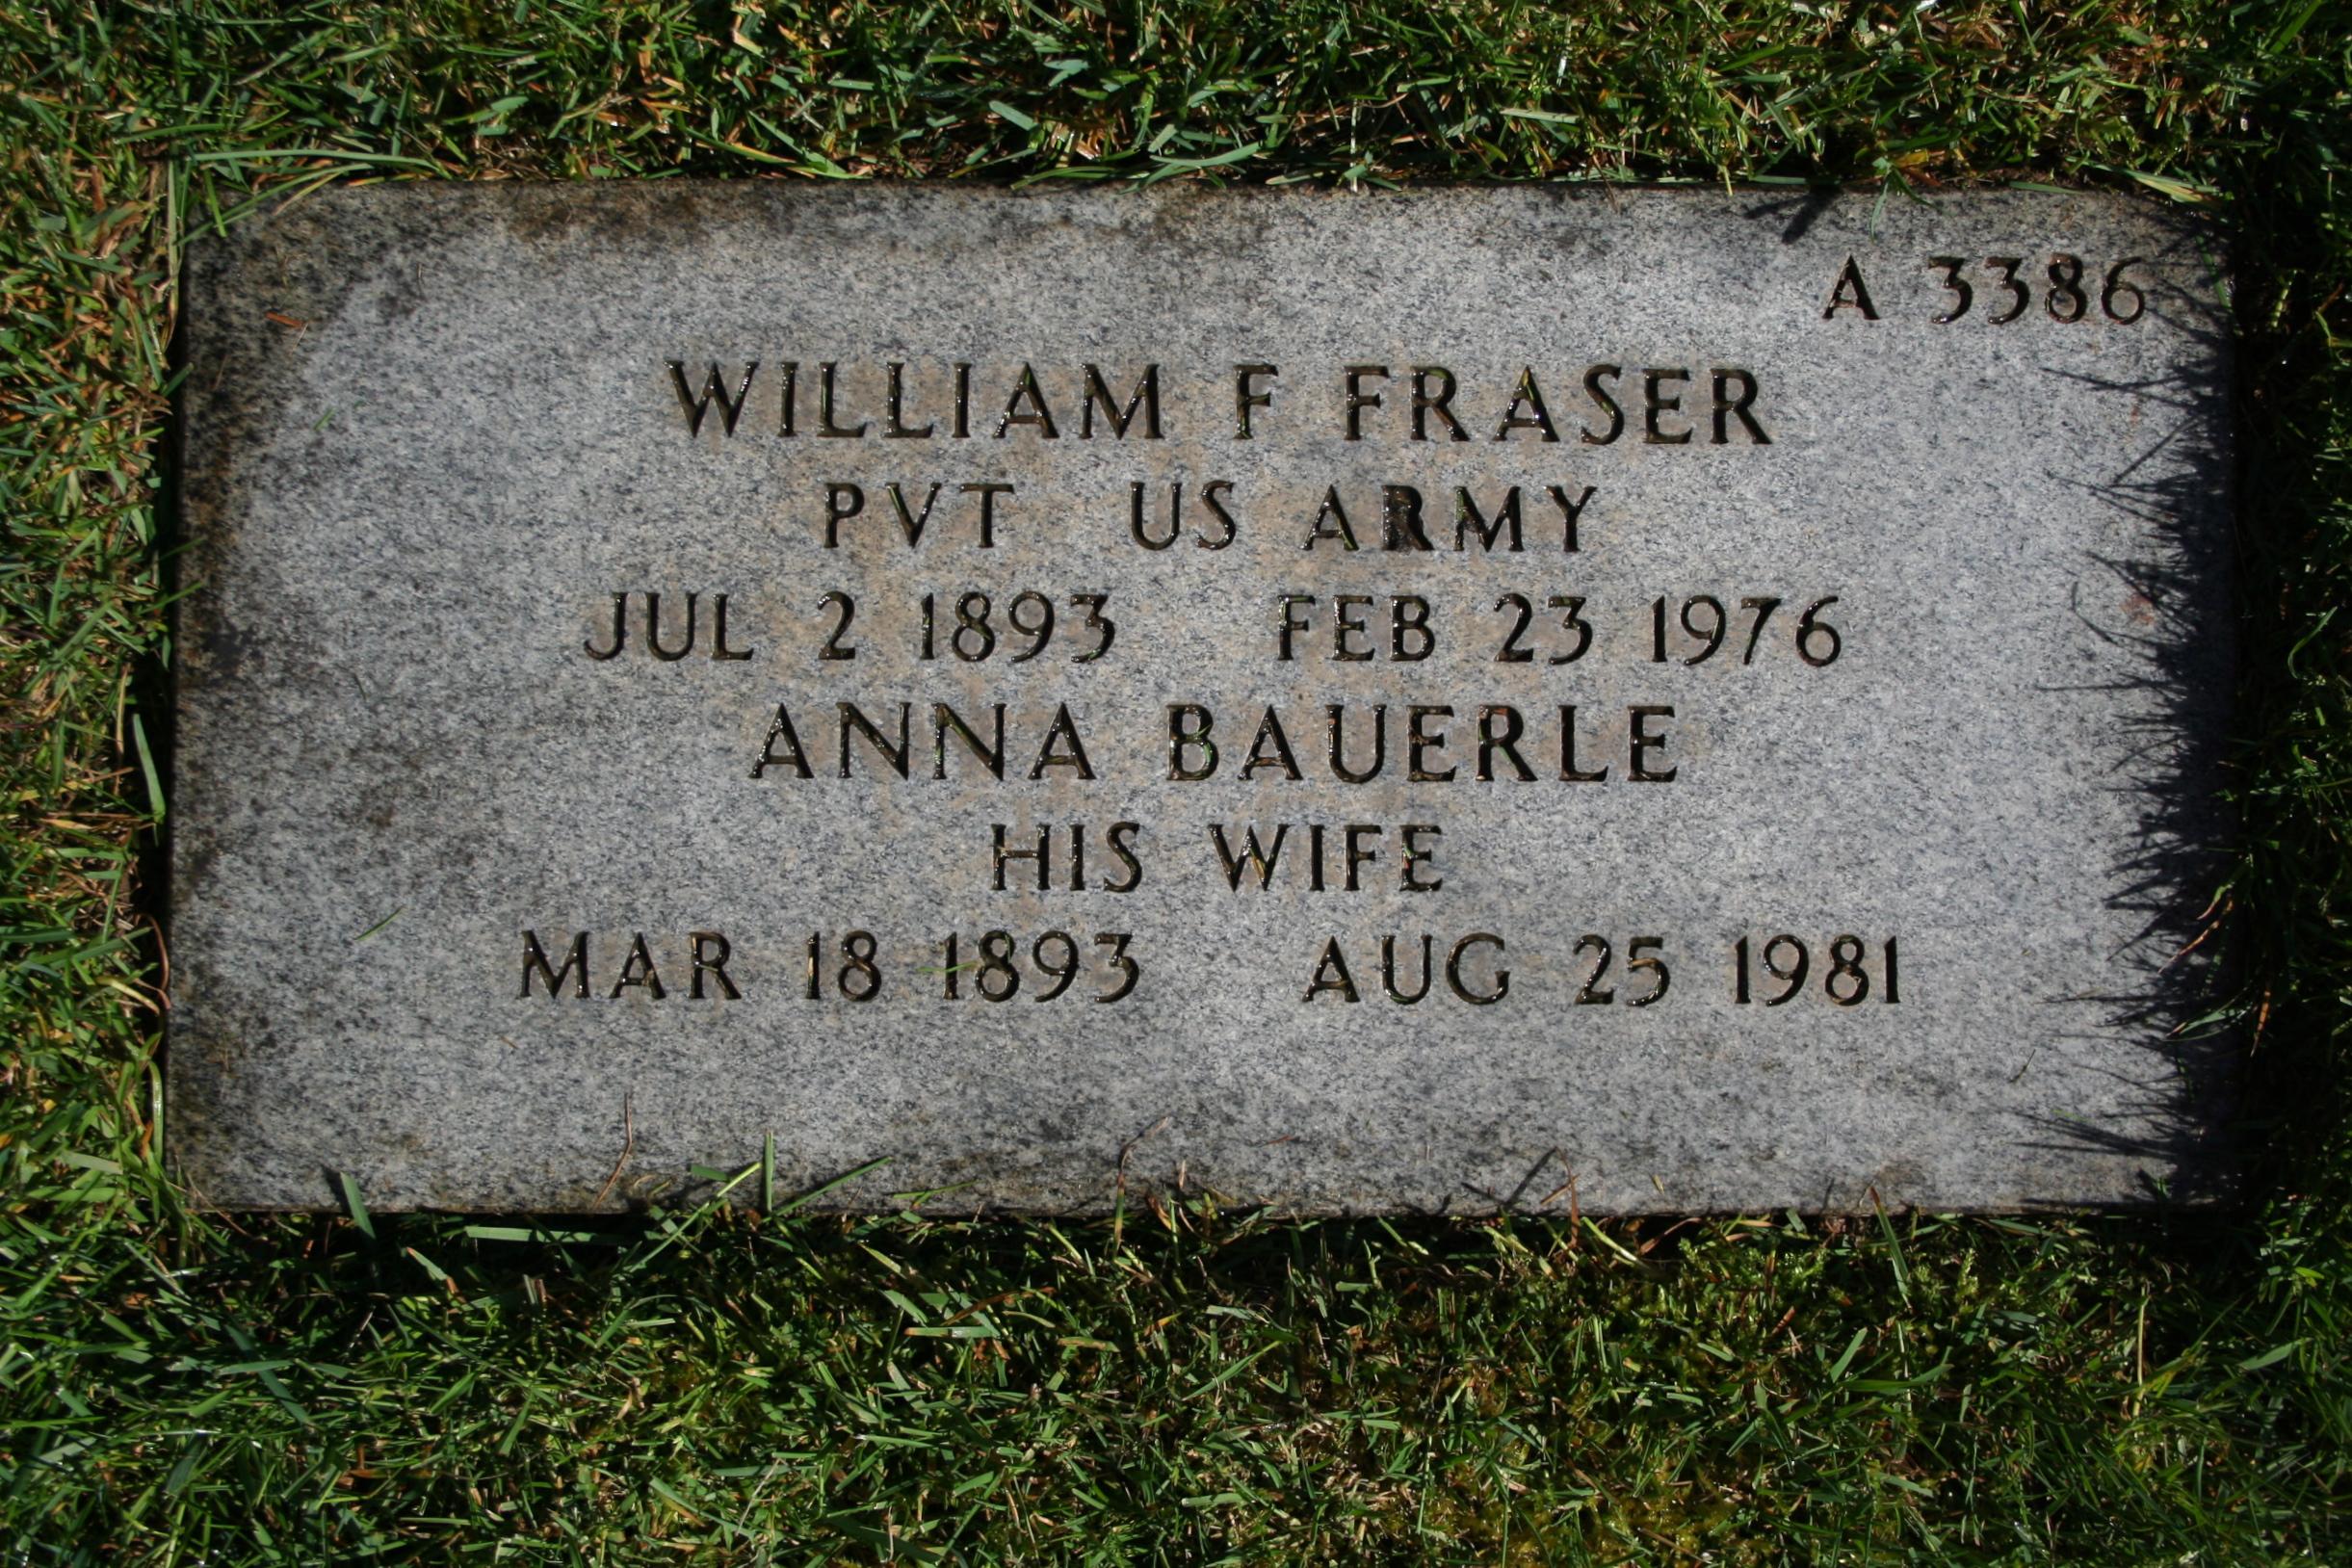 William F Fraser